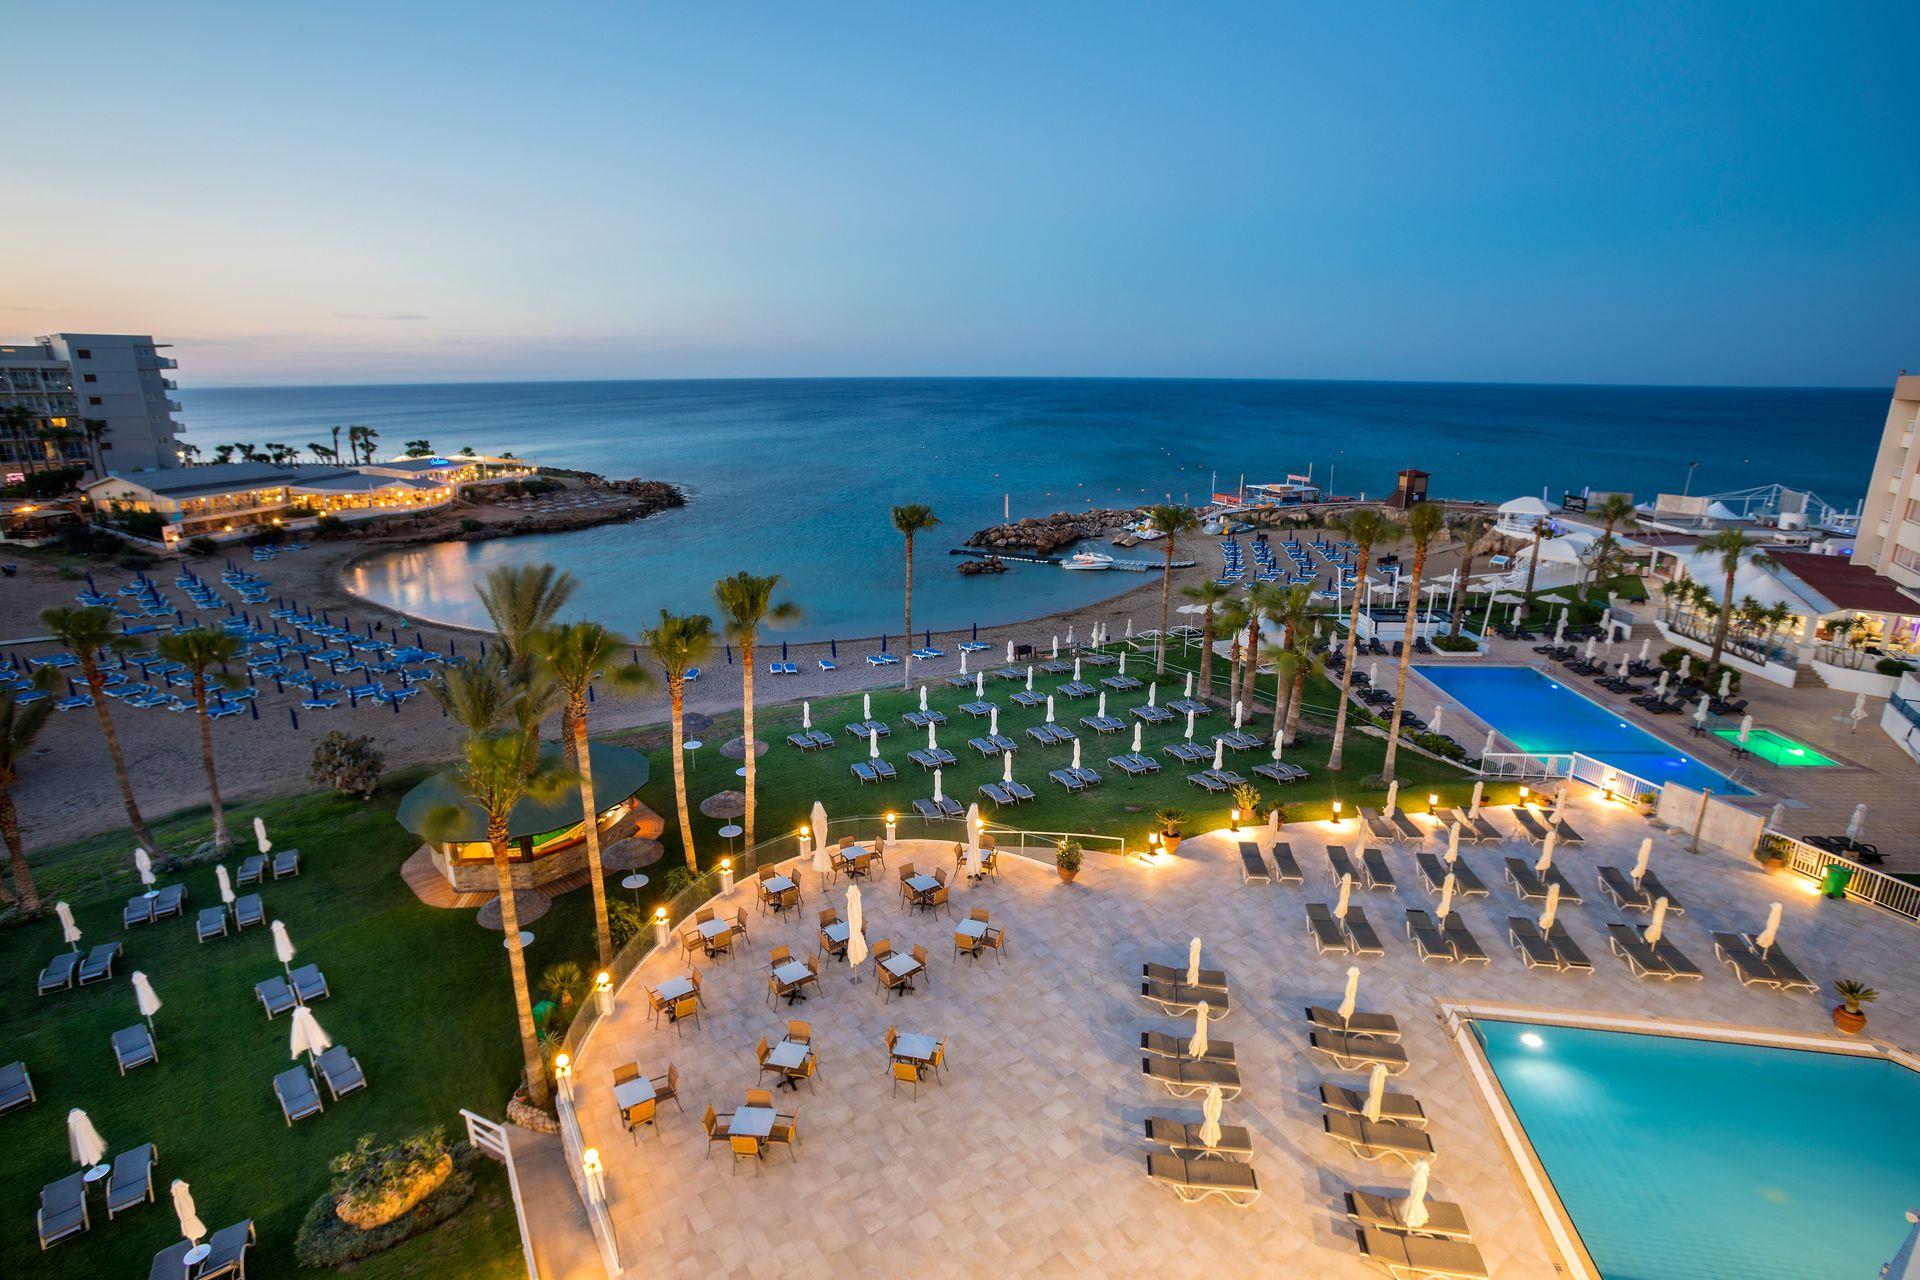 4* Infinity Blu – Designed for adults - Κύπρος ✦ -7% ✦ 4 Ημέρες (3 Διανυκτερεύσεις) ✦ 2 άτομα ✦ Πρωινό ✦ 01/08/2021 έως 31/08/2021 ✦ Μπροστά στην παραλία!